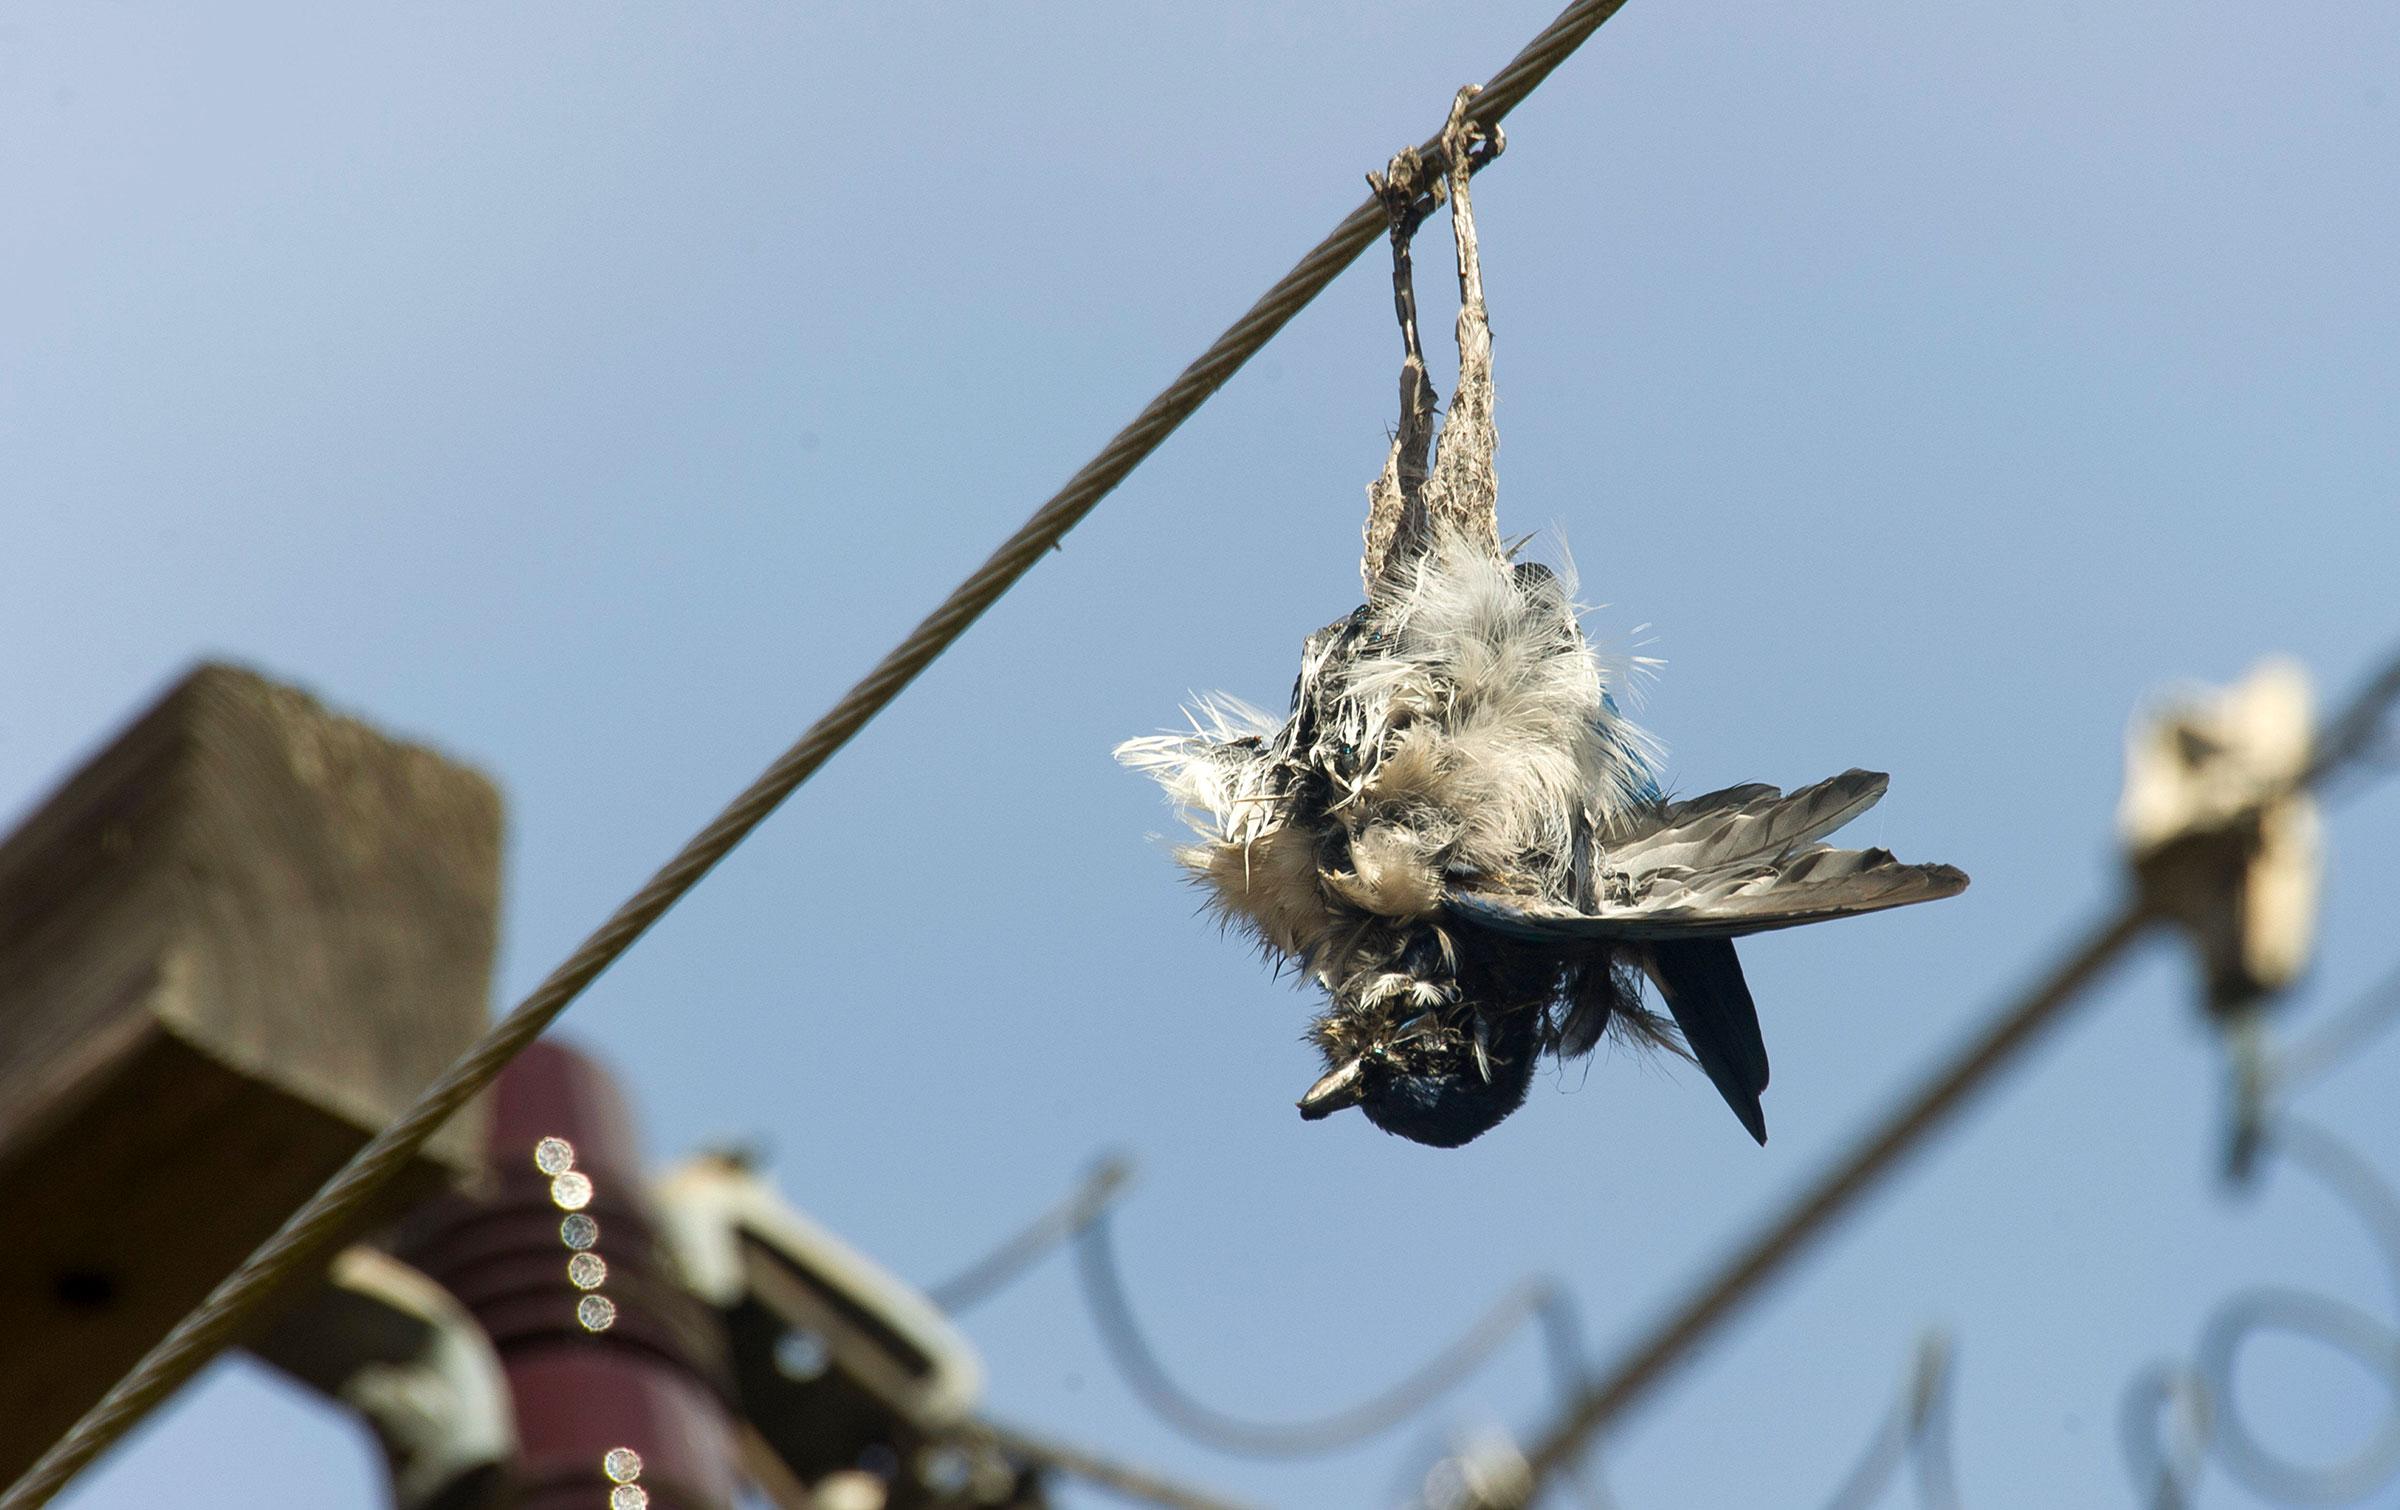 An electrocuted California Scrub-Jay hangs from a power line in Oregon. ZUMA Press Inc./Alamy